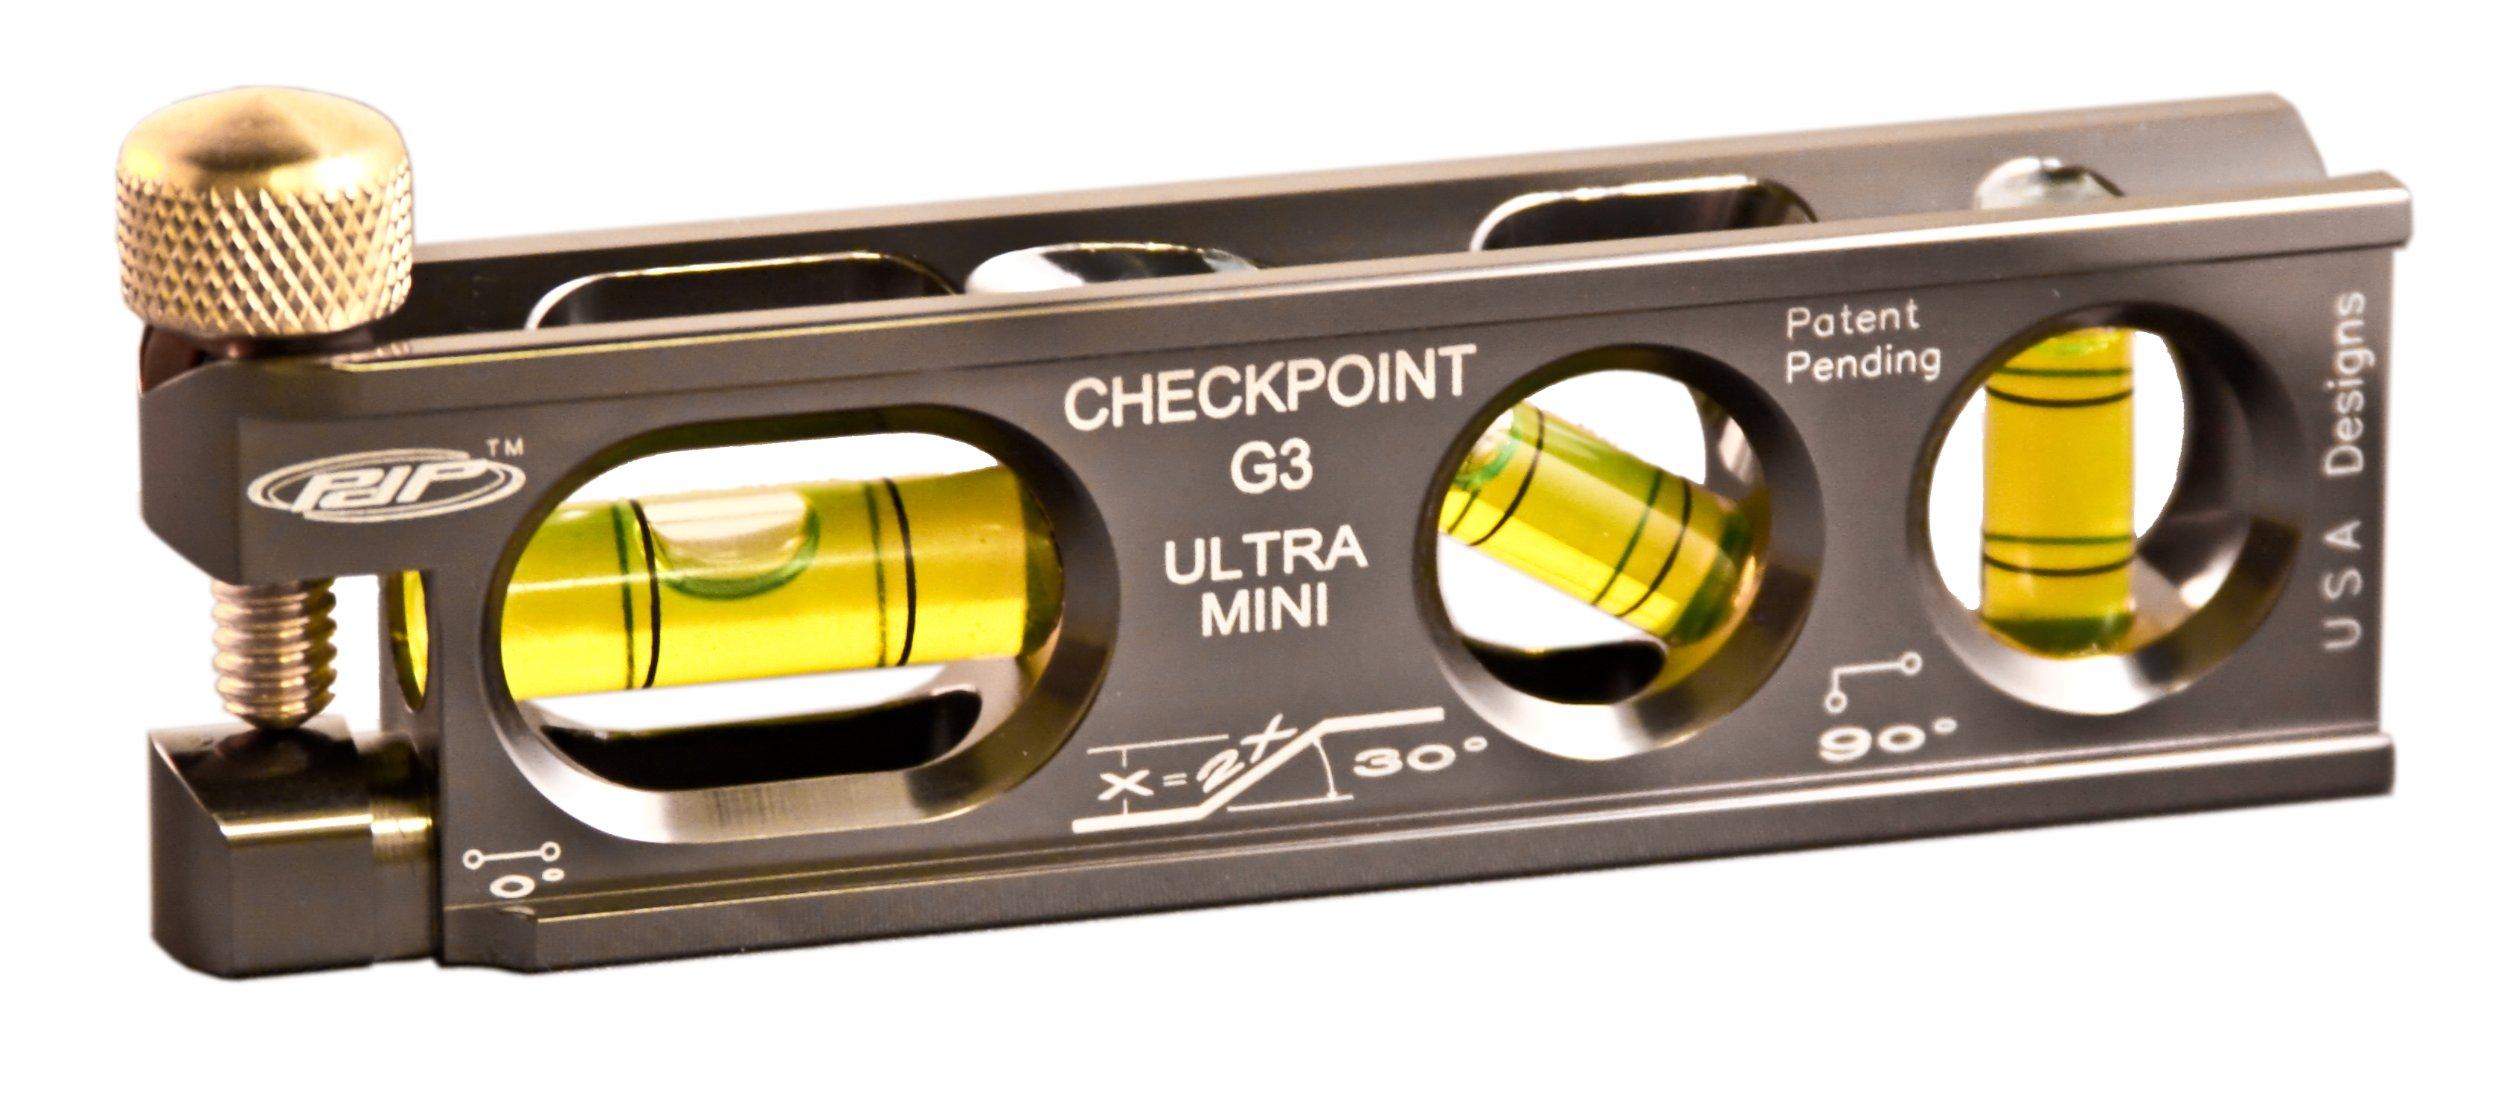 CHECKPOINT 0303PL Ultra-Mini G3 Torpedo Level, Platinum